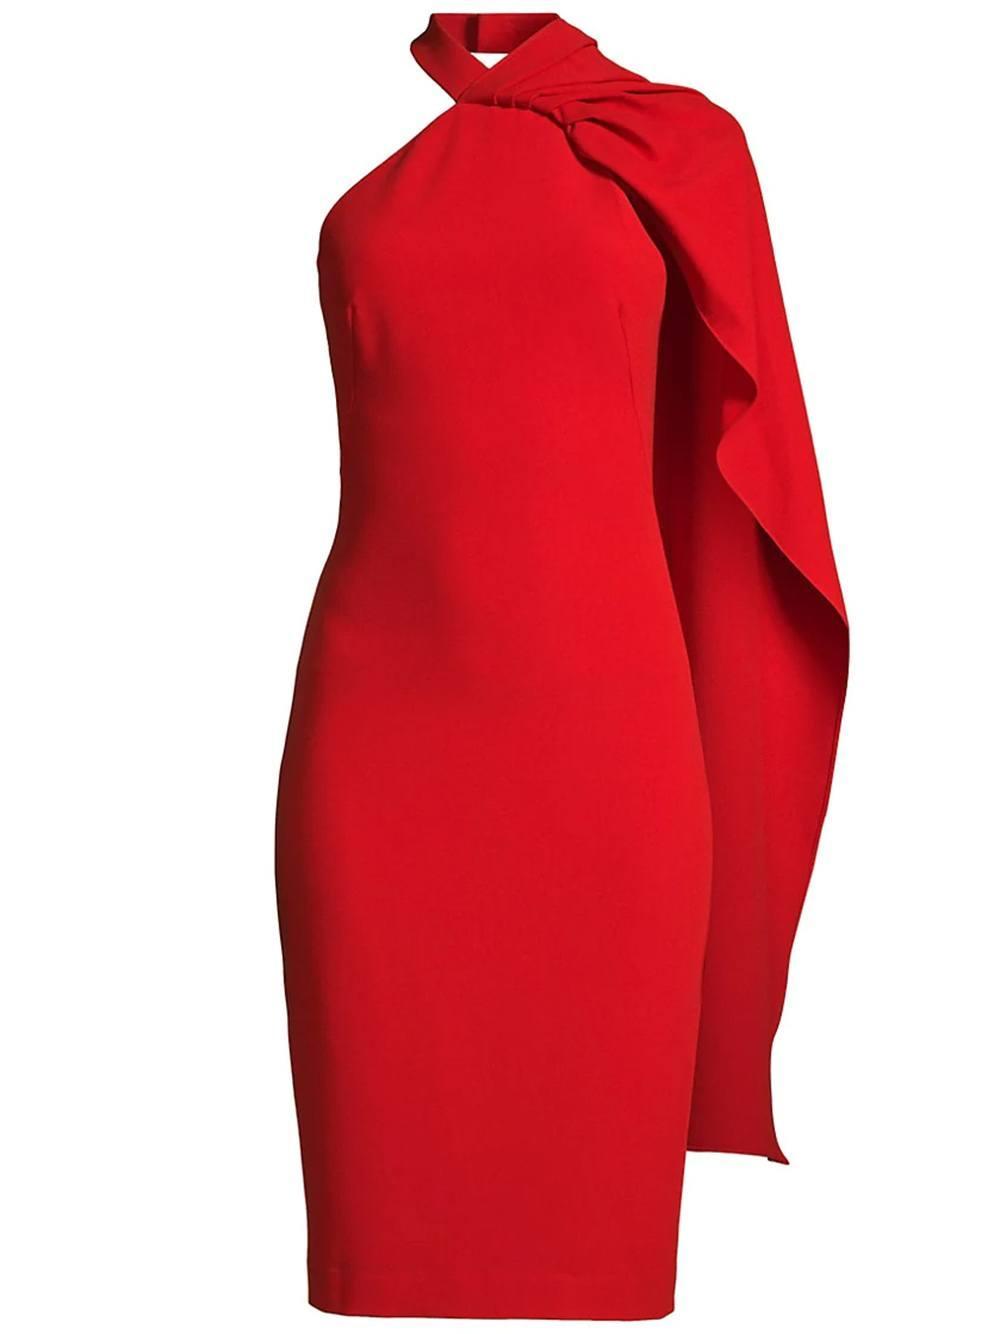 Zion Sheath Dress Item # 3002902